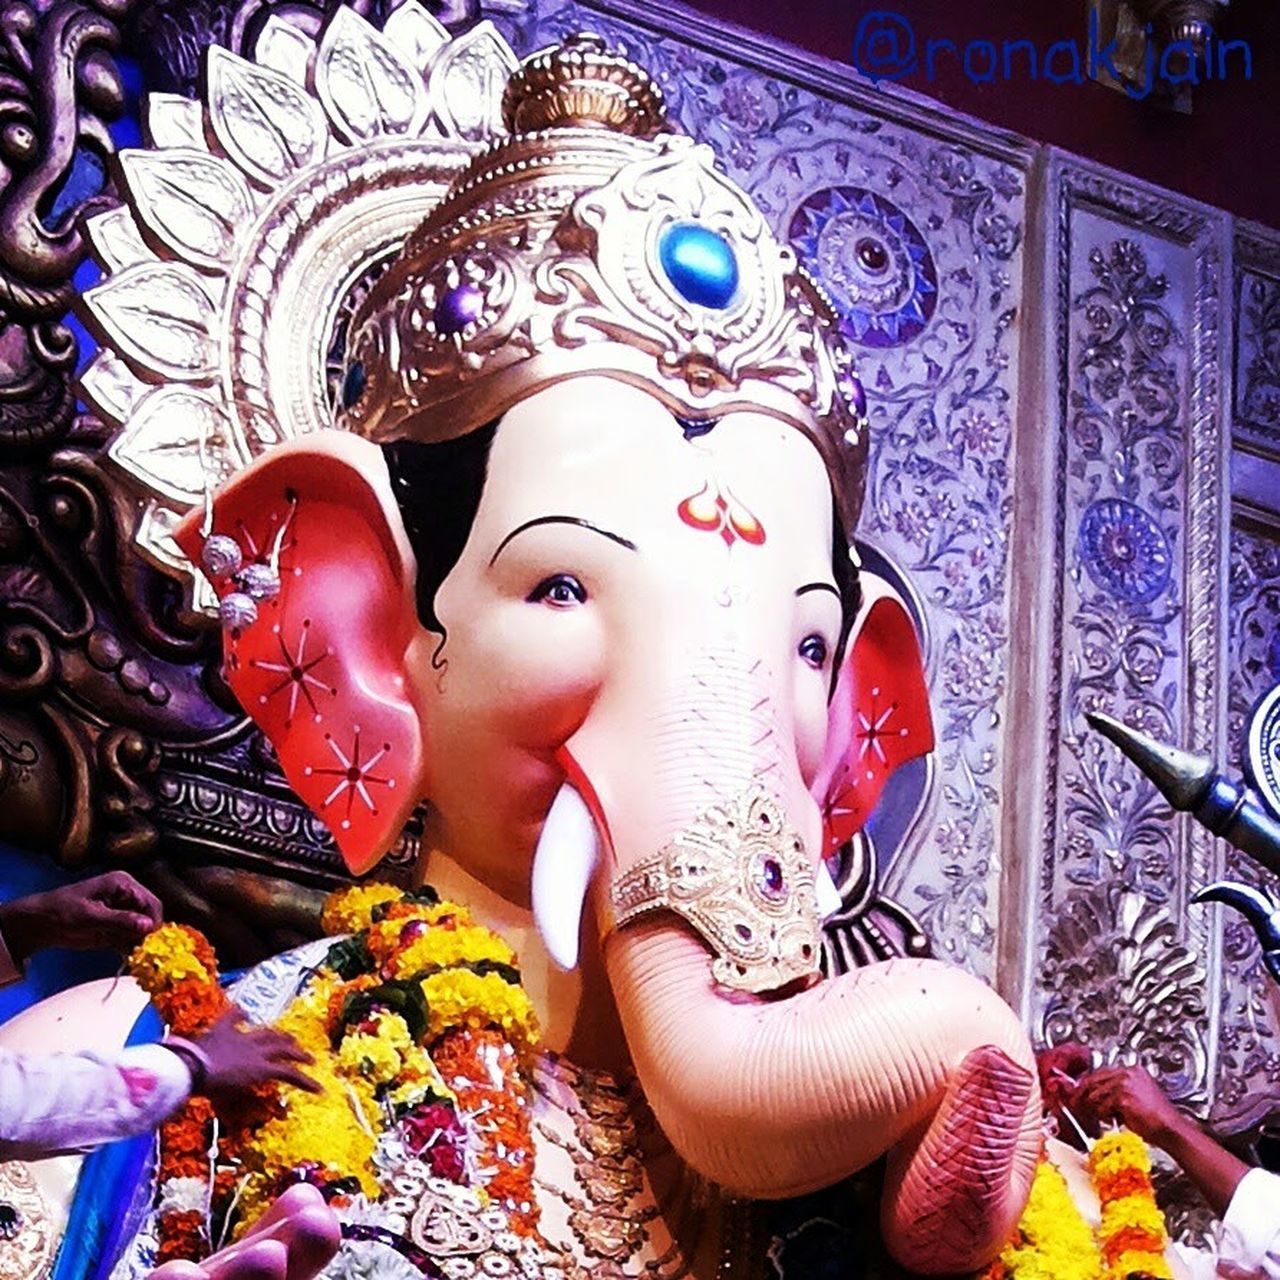 GanpatiBappaMorya GanpatiBappa GanpatiFest Ganpatibapamorya Ganpati Festival Ganpatipule Ganpati_bappa_morya Ganpathibappamorya Ganpatibappamoriya Ganpaticelebrations GaNpAti_ViSeRjAn GanpatiBappaMoryaa Ganpatifestival Ganpatipule India Ganpati_bappa Ganpatiphotography GanpatiPuja Ganpatidecorations Ganpatidarshan Ganpati Idol Making Ganpati Statue Ganpati Dance Ganpati_in_clicks Ganpati_pule Ganpati Bappa Morya